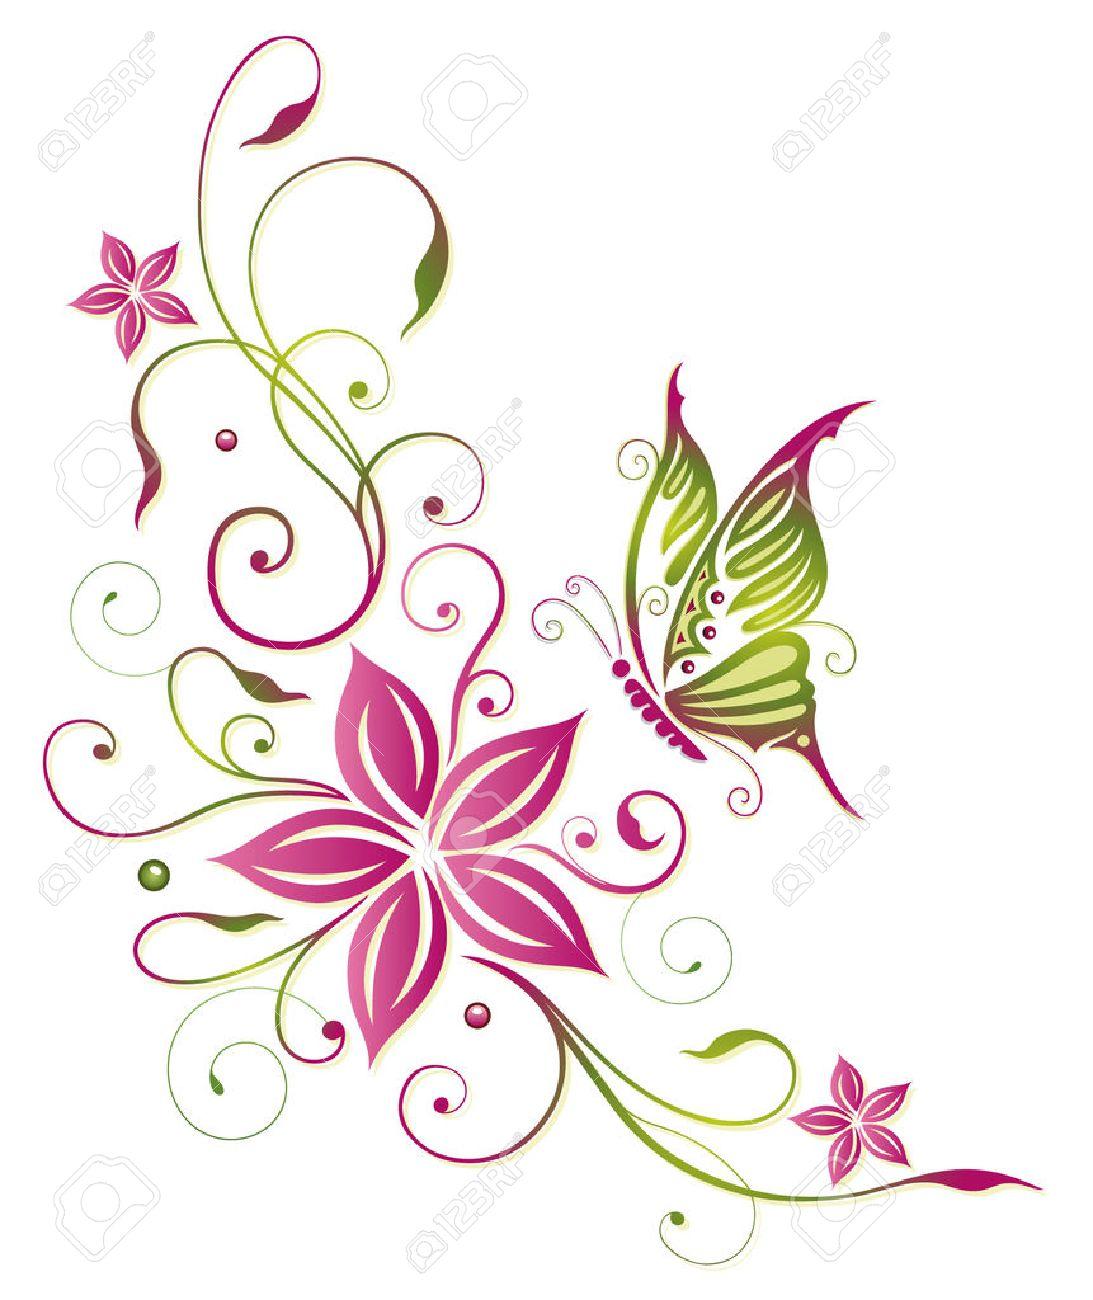 Large flower with butterfly Standard-Bild - 43682724